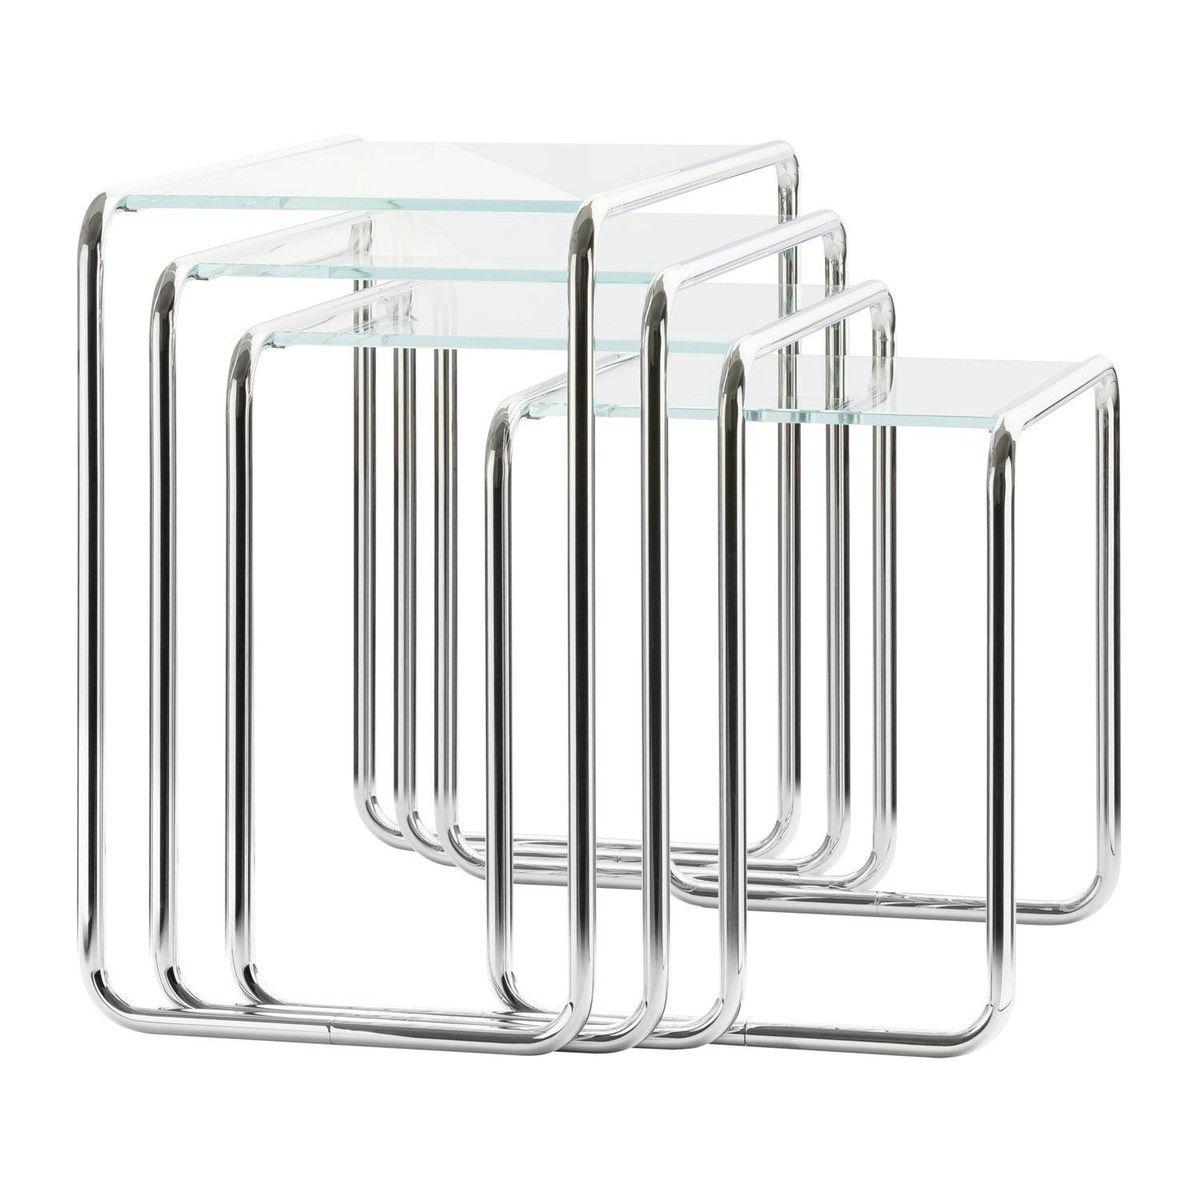 Thonet   Thonet B9 Side Table Set Glass   White / Frame Chrome/glass  Optiwhite